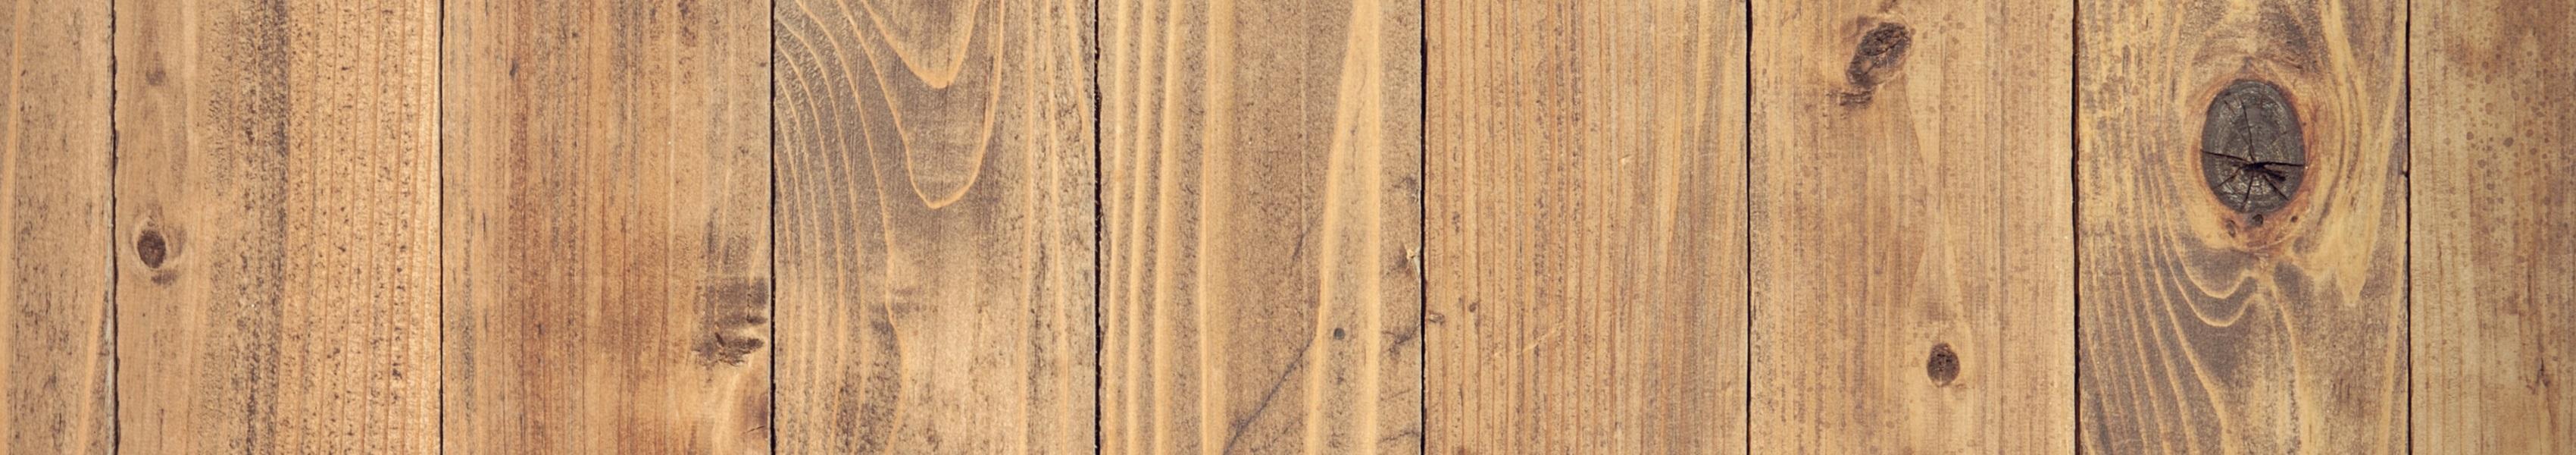 225mm x 22mm  (9 x 1) Timber